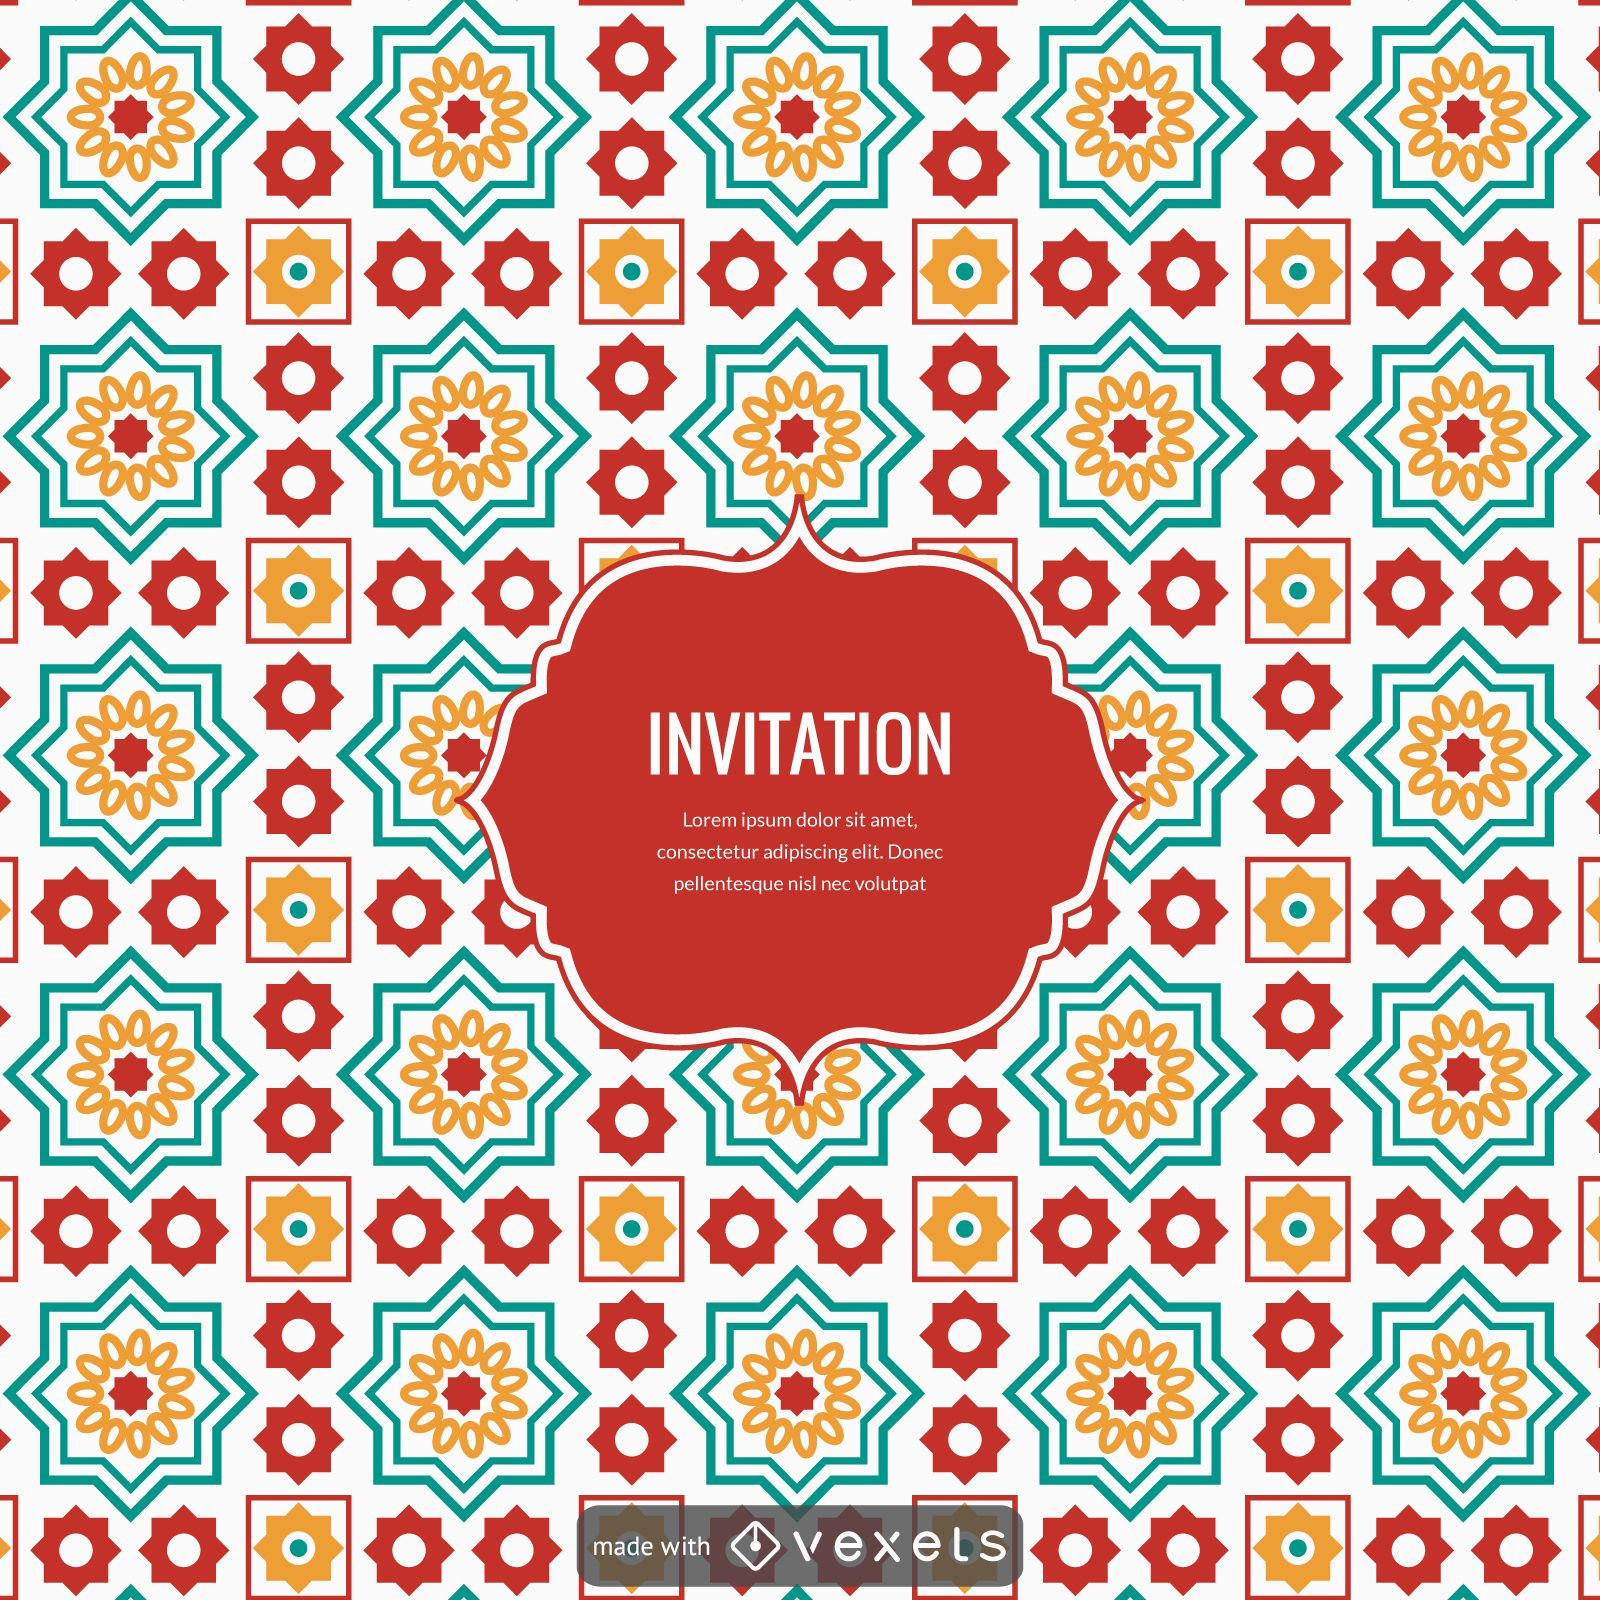 Ramadan Arabic Tiles Design Creator Large Image 1600x1600px